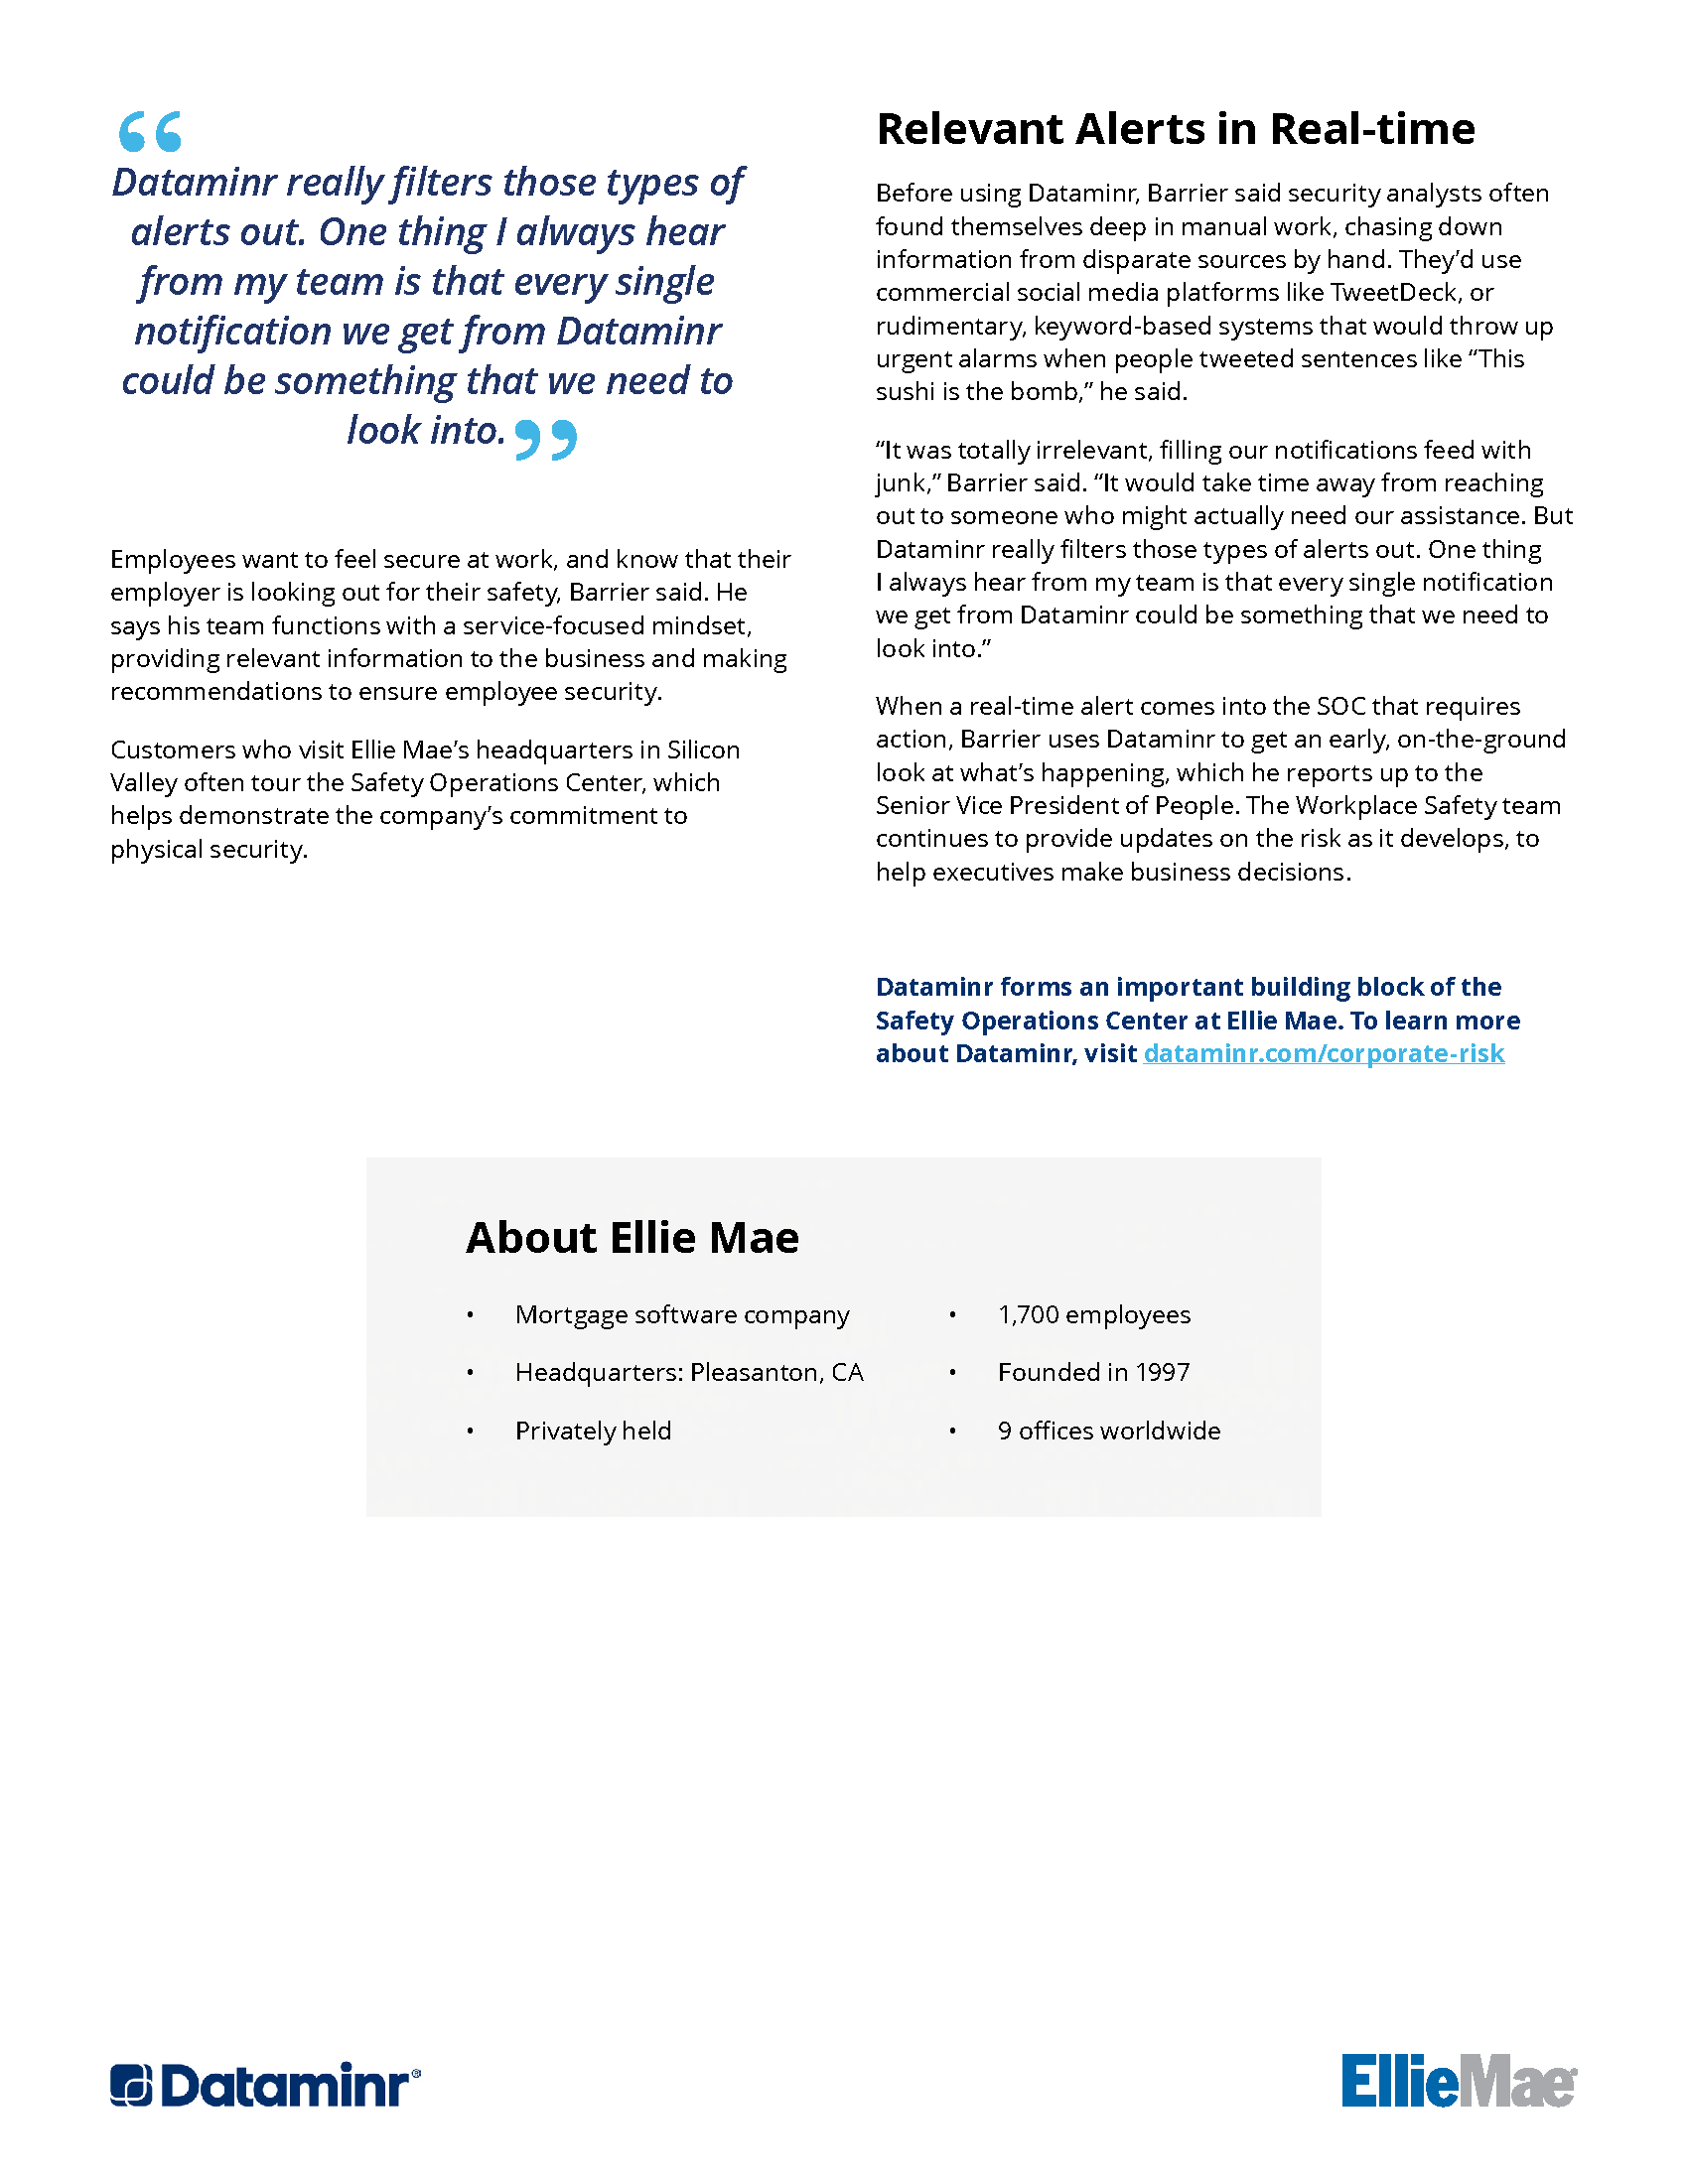 Dataminr Case Study - Ellie Mae_Page_2